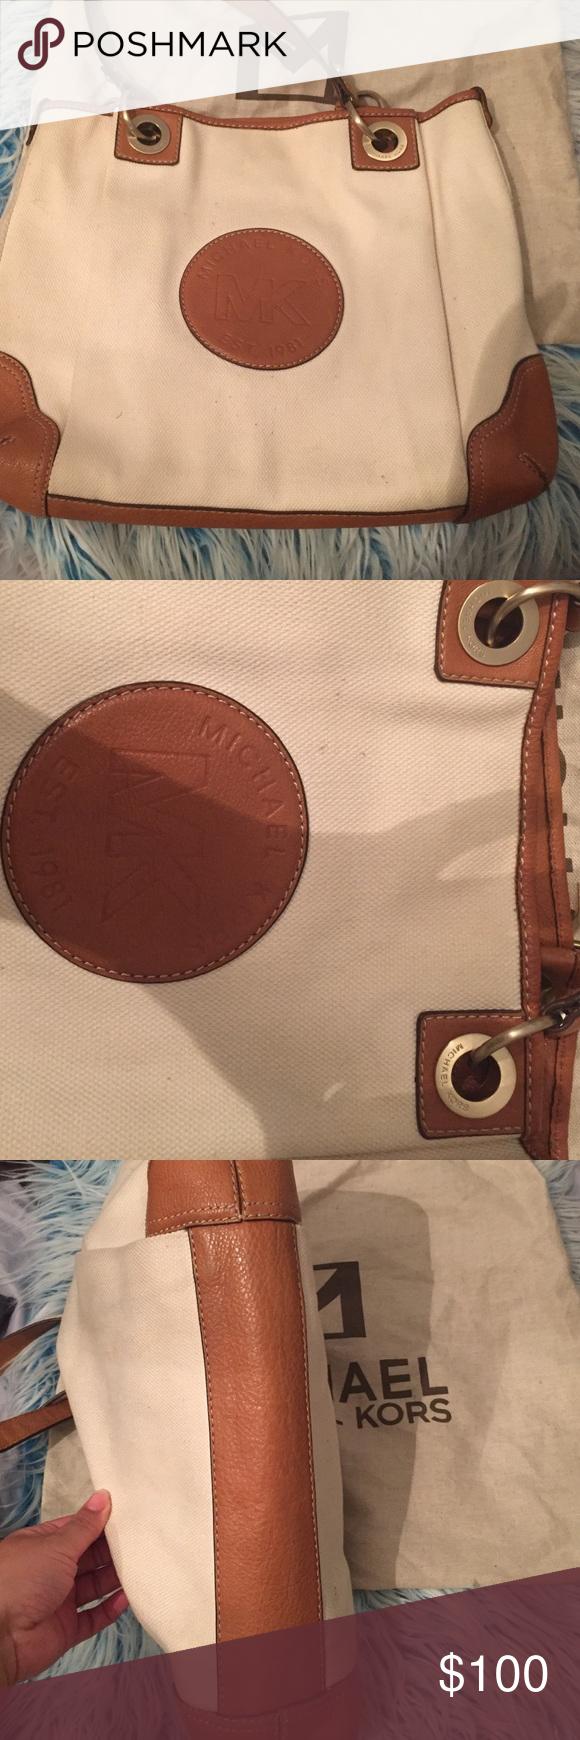 Michael Kors handbag pre owned Tan leather with beige cloth Michael Kors handbag previously worn great condition! MICHAEL Michael Kors Bags Hobos